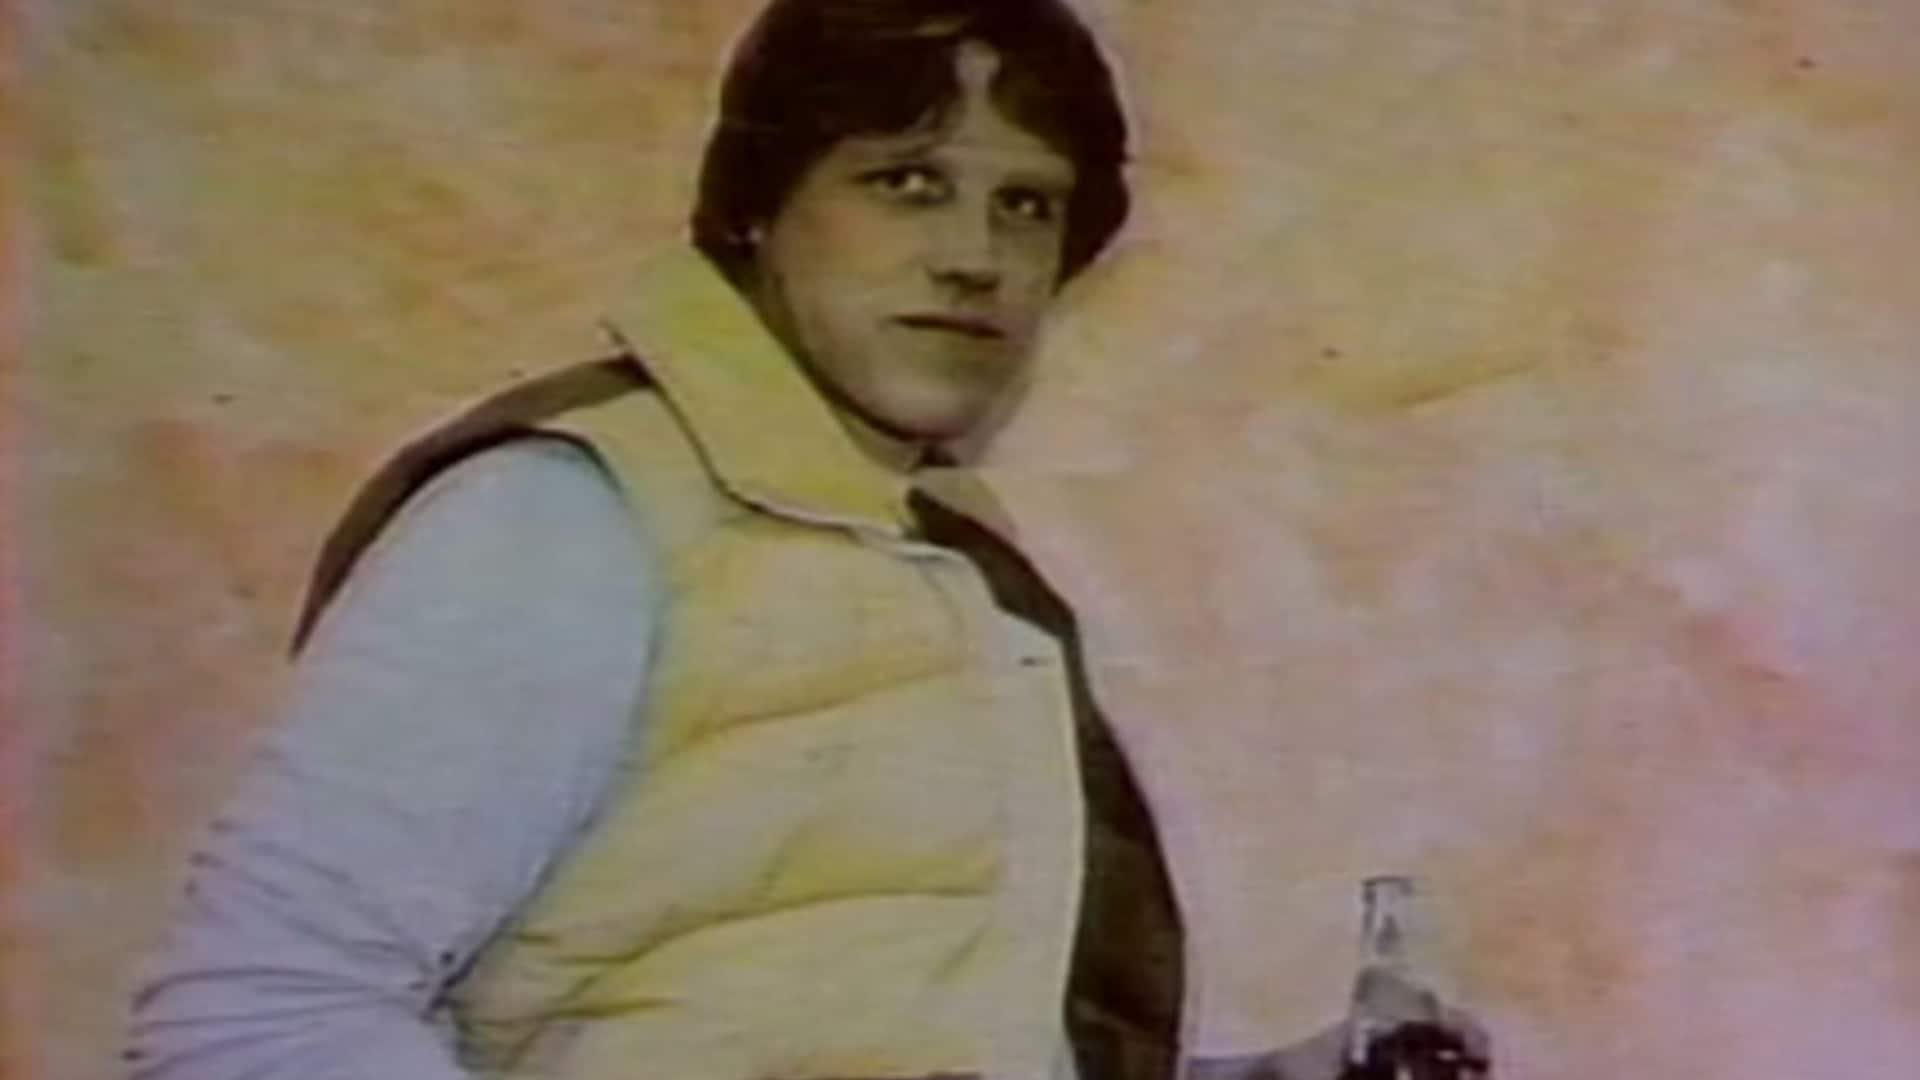 Gary Busey: March 10, 1979